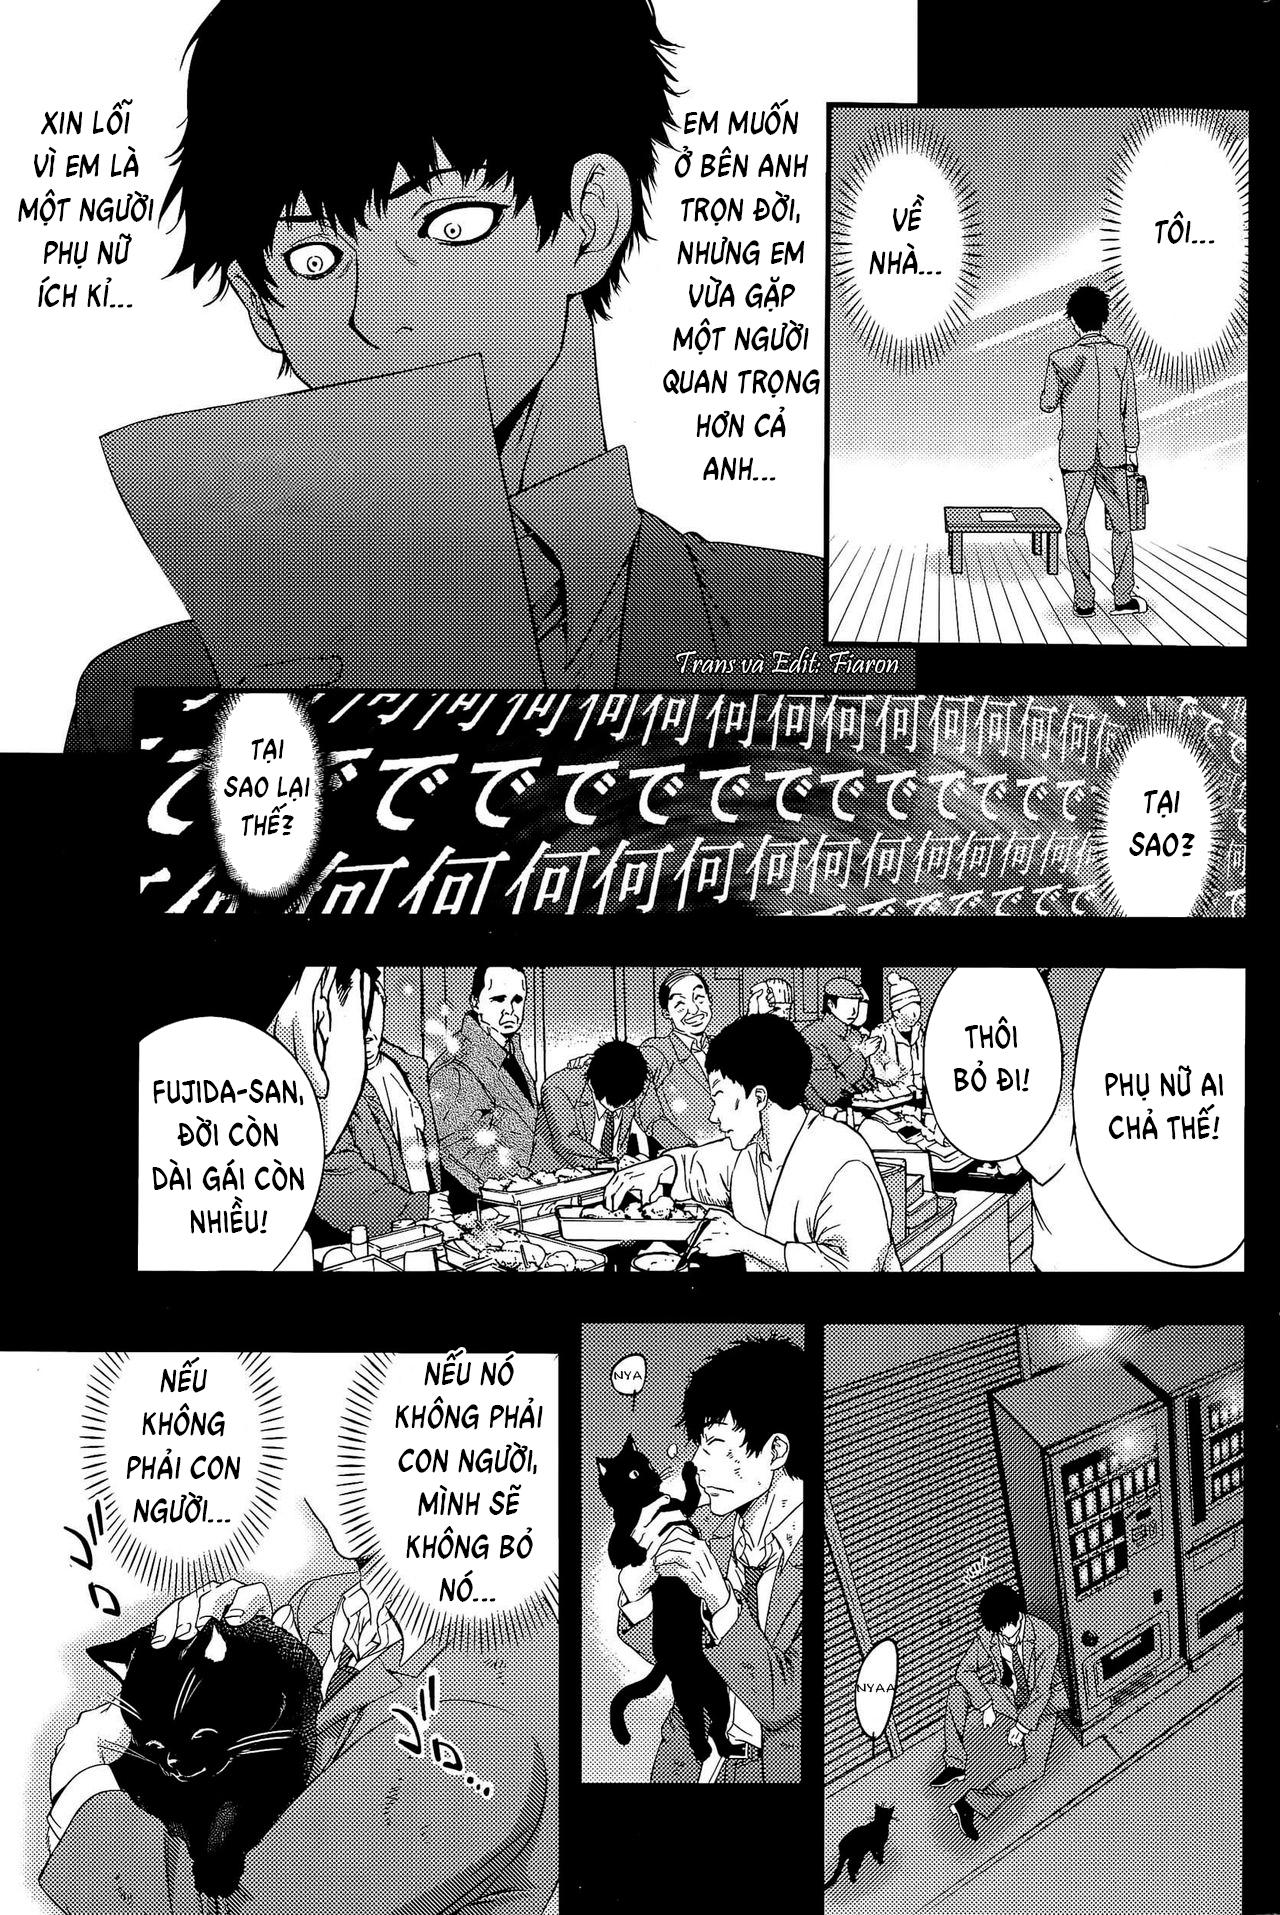 Hình ảnh  trong bài viết Kekkon Suru Nara Mesuneko to